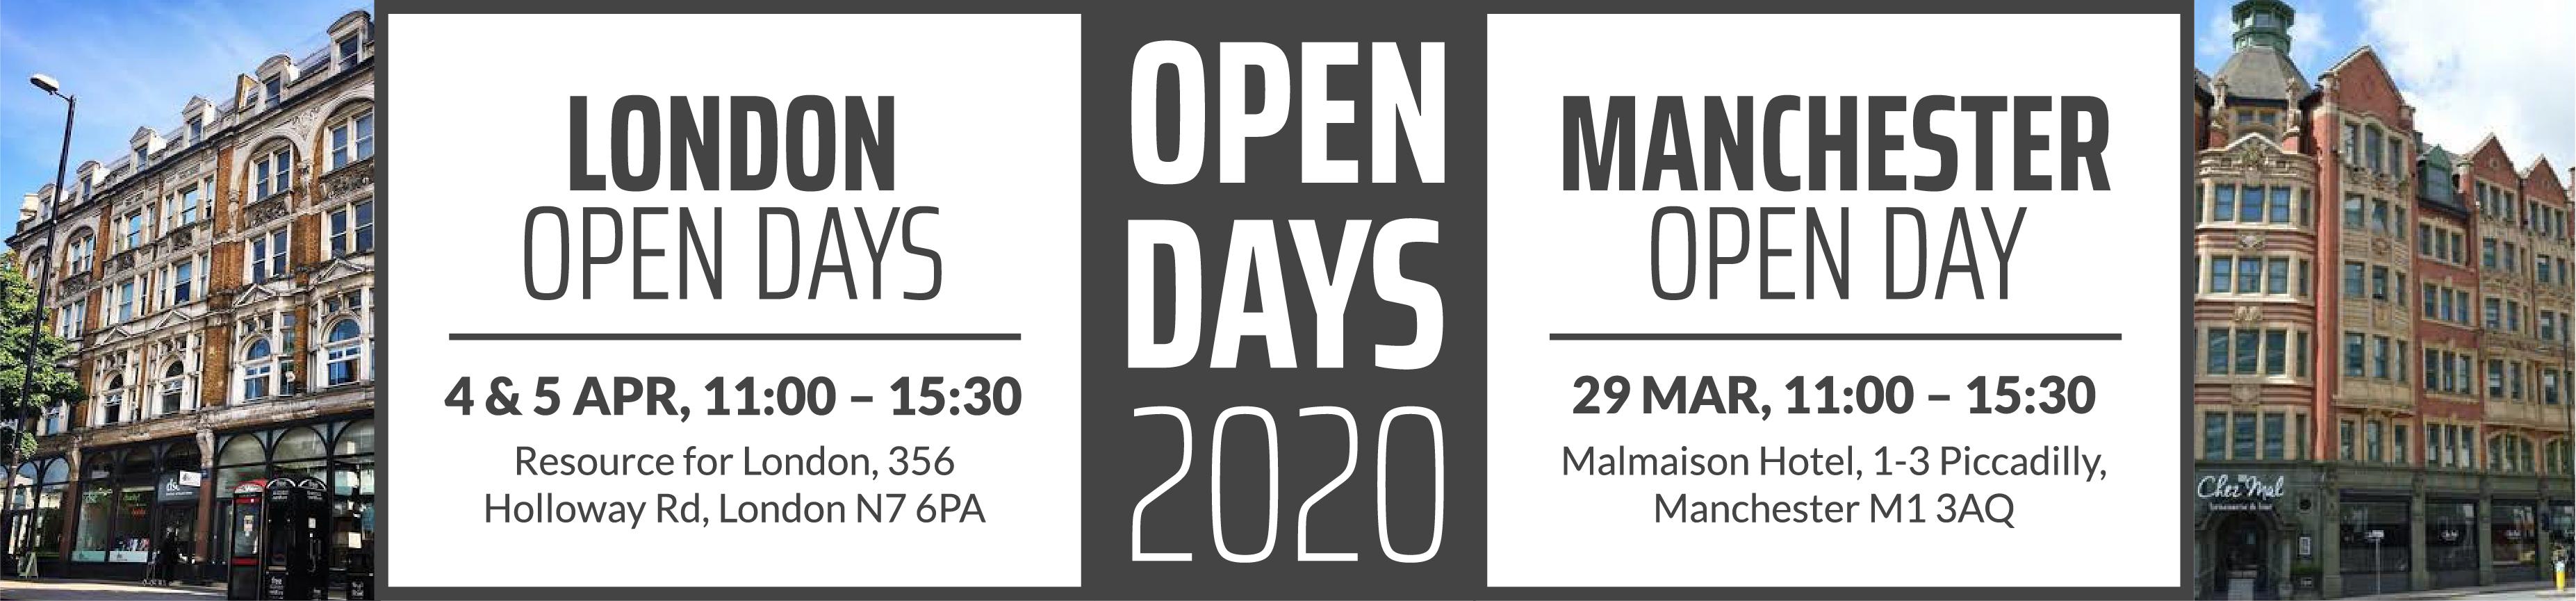 UK Open Day